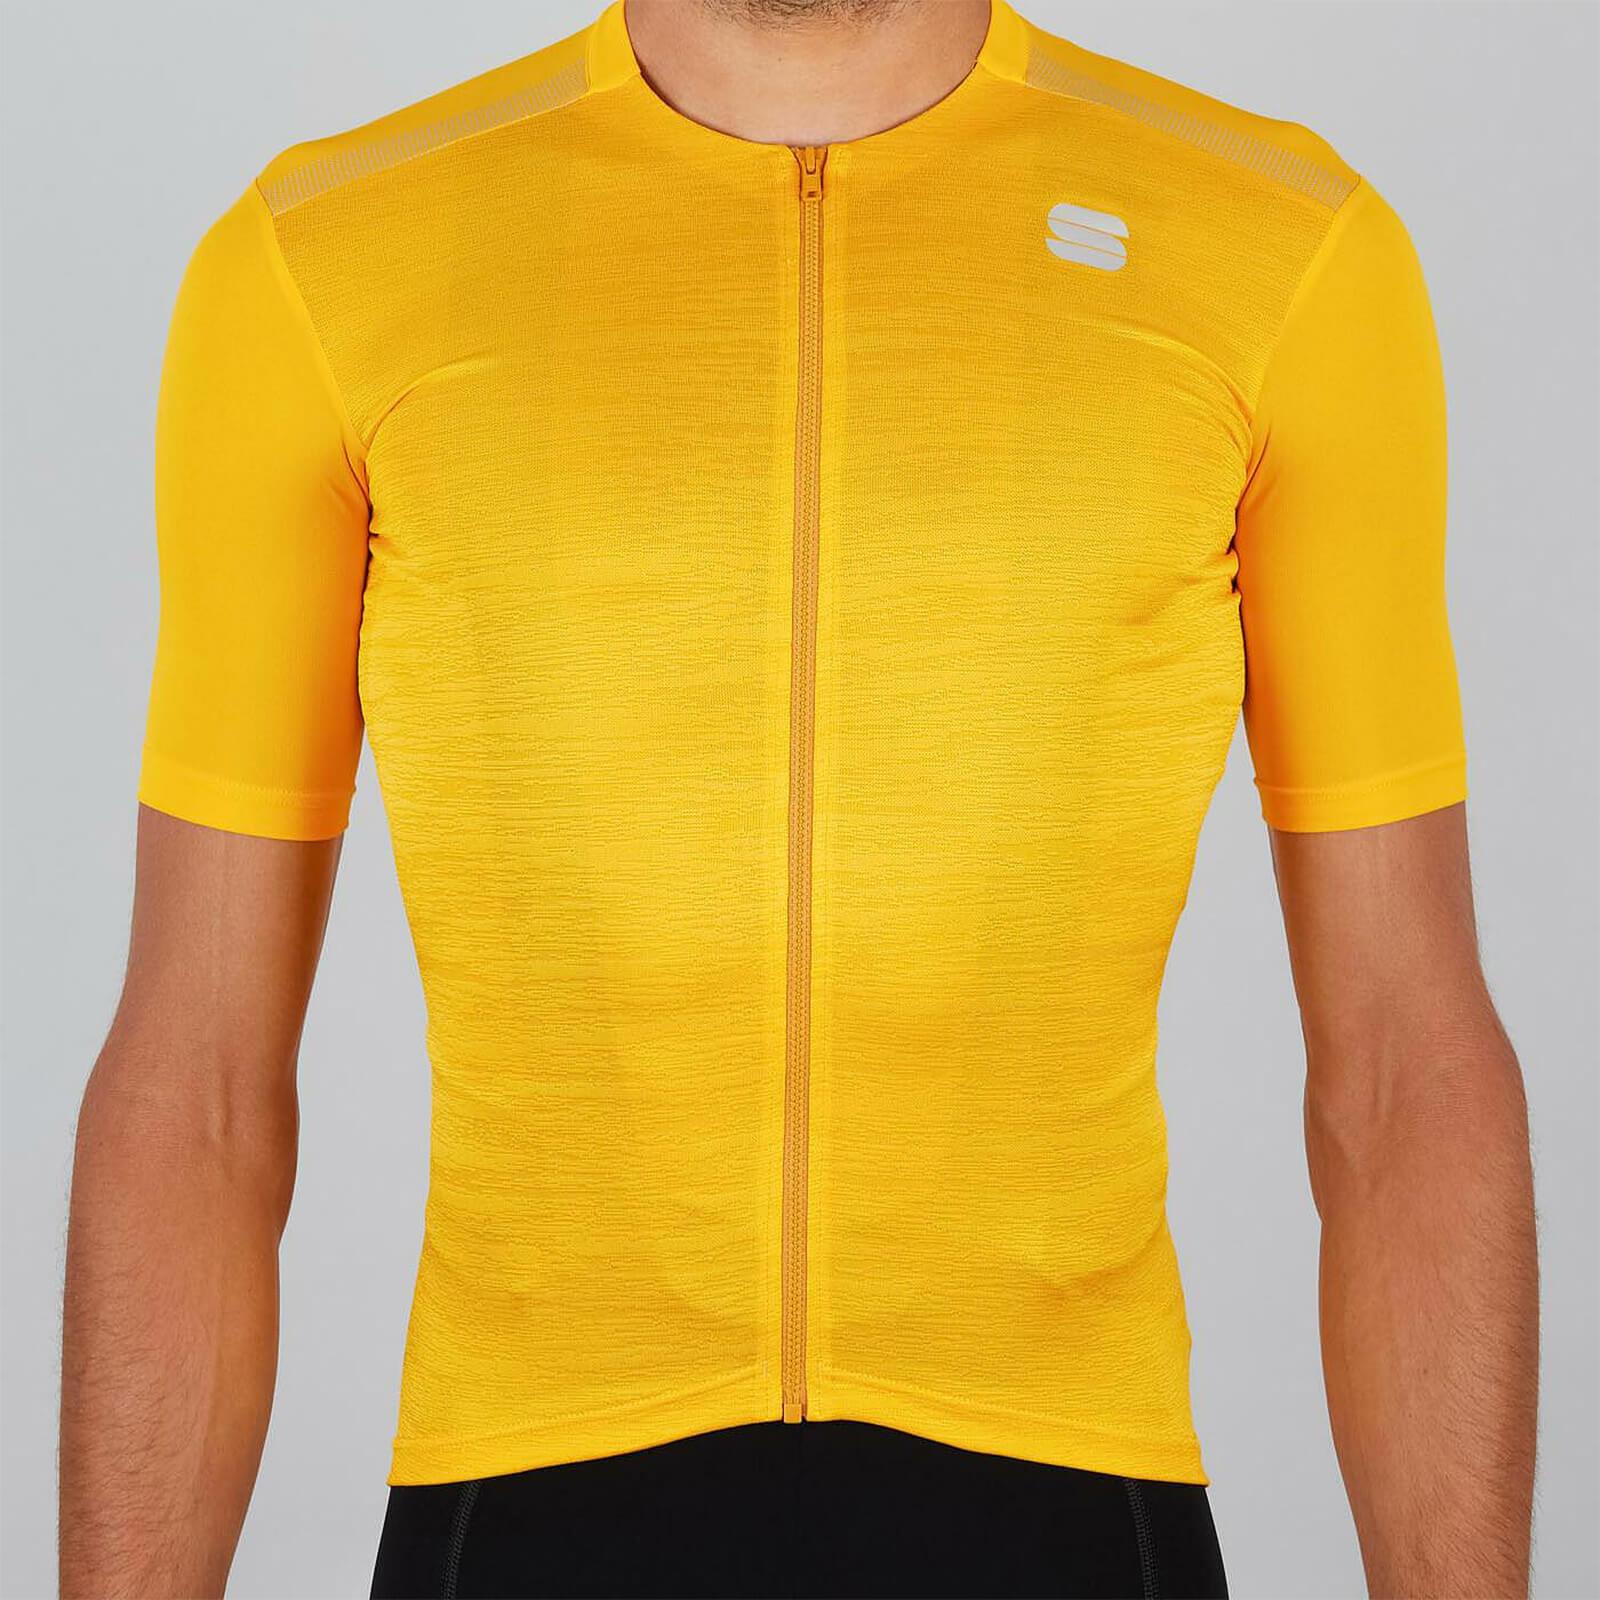 Sportful Supergiara Jersey - S - Yellow